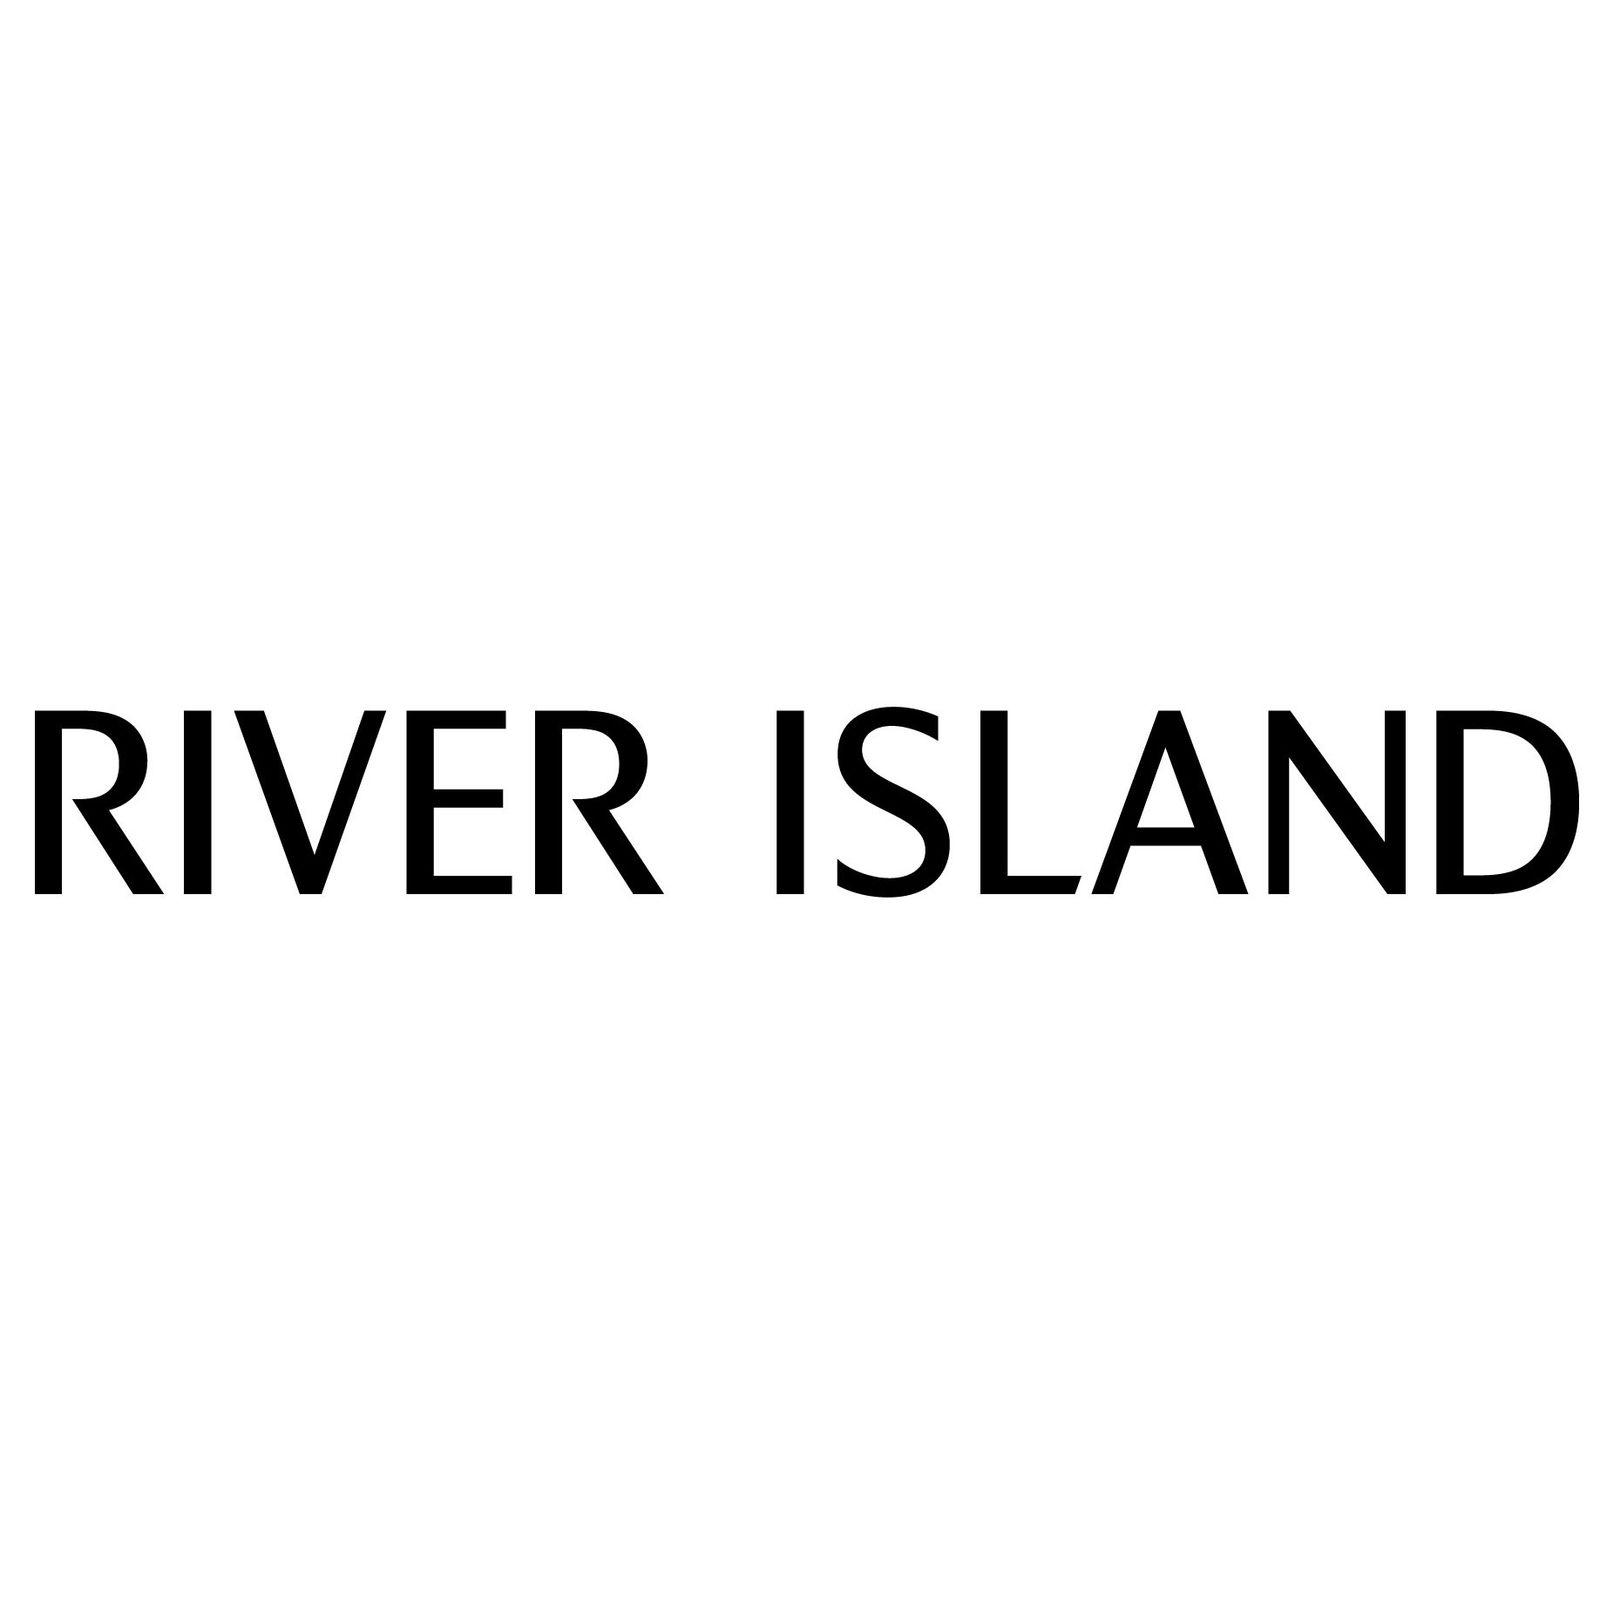 RIVER ISLAND (Image 1)